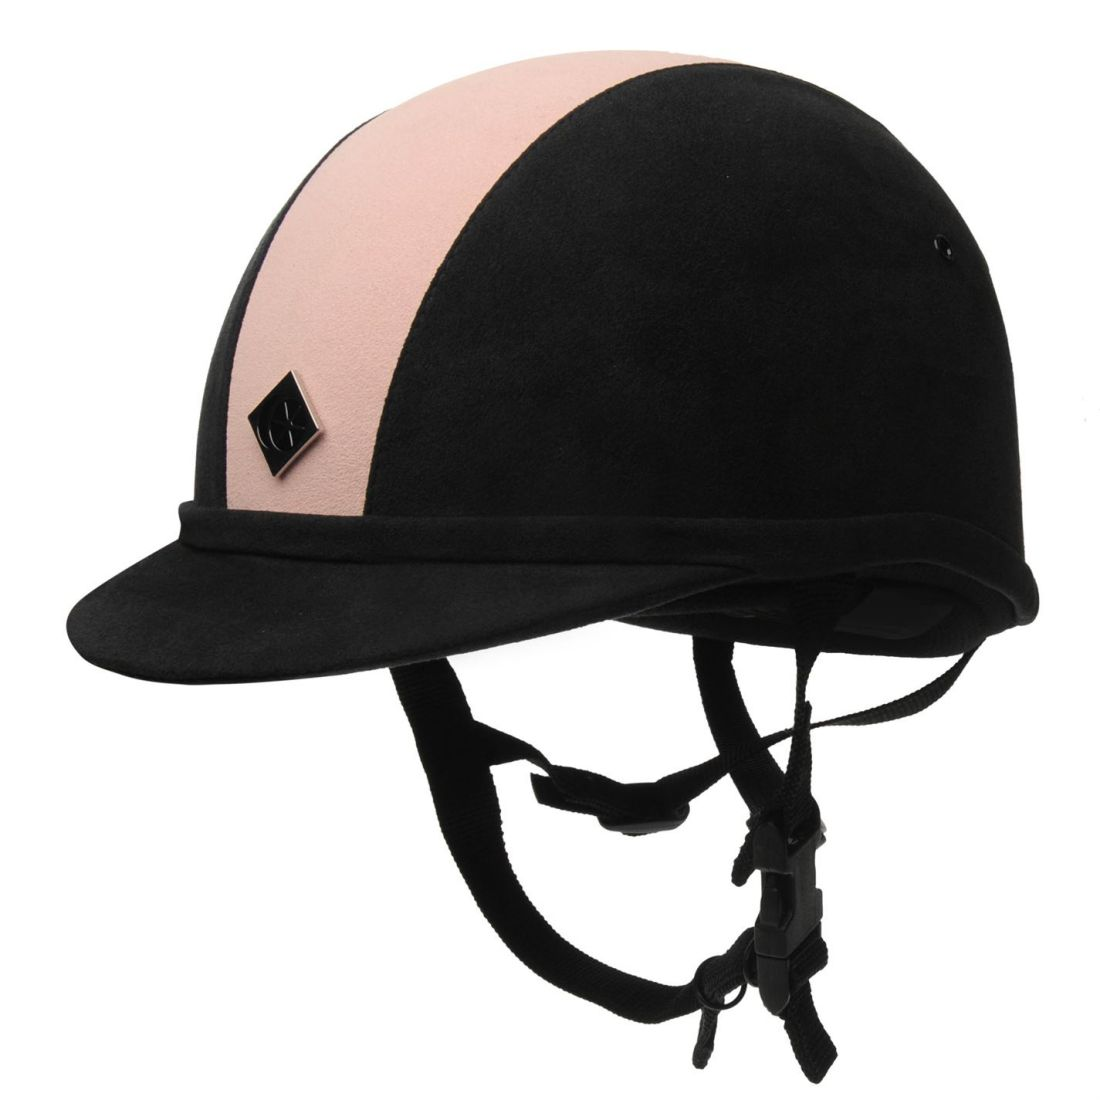 Charles Owen Kids YR8 Hat Jnr 61 Horse Riding Hat Helmet